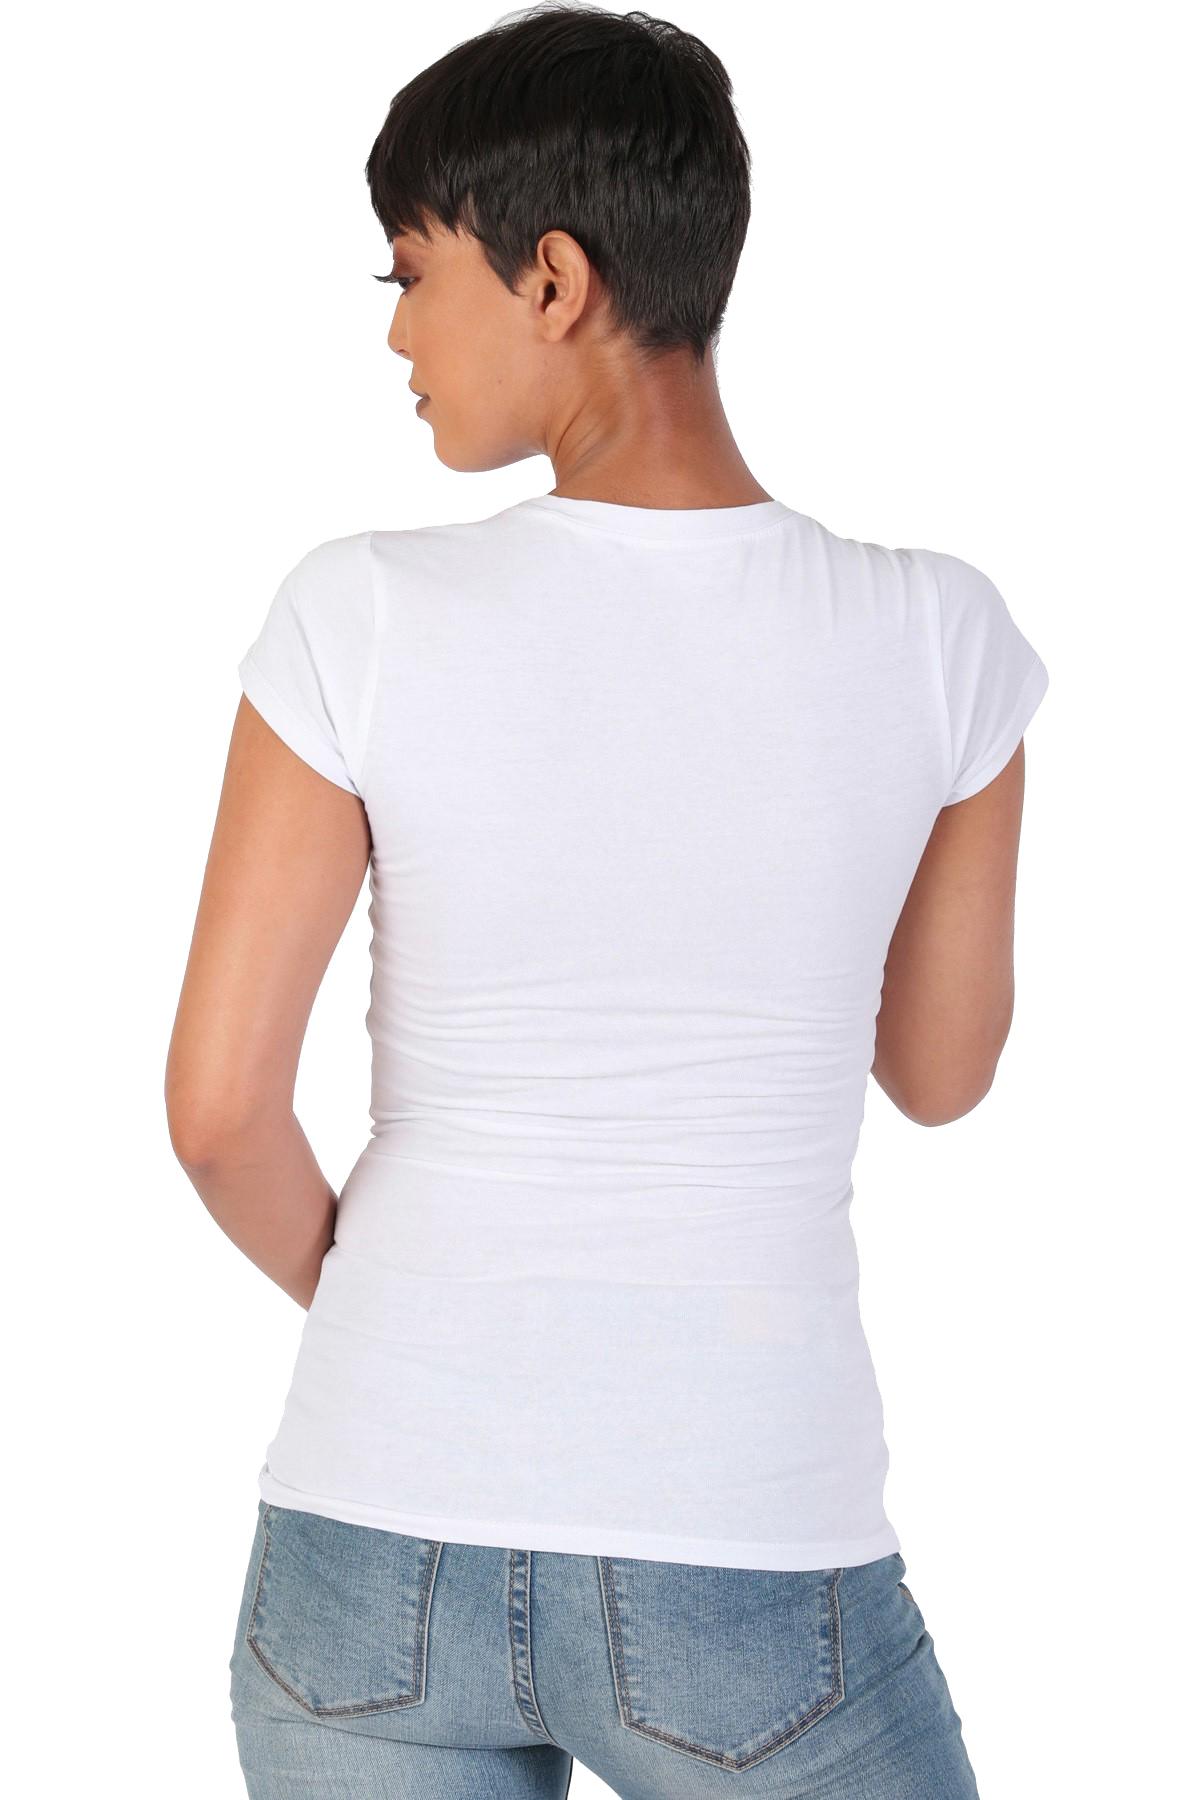 Women-039-s-Juniors-Patriotic-Casual-Graphic-Print-Short-Sleeve-T-Shirt-Top thumbnail 12